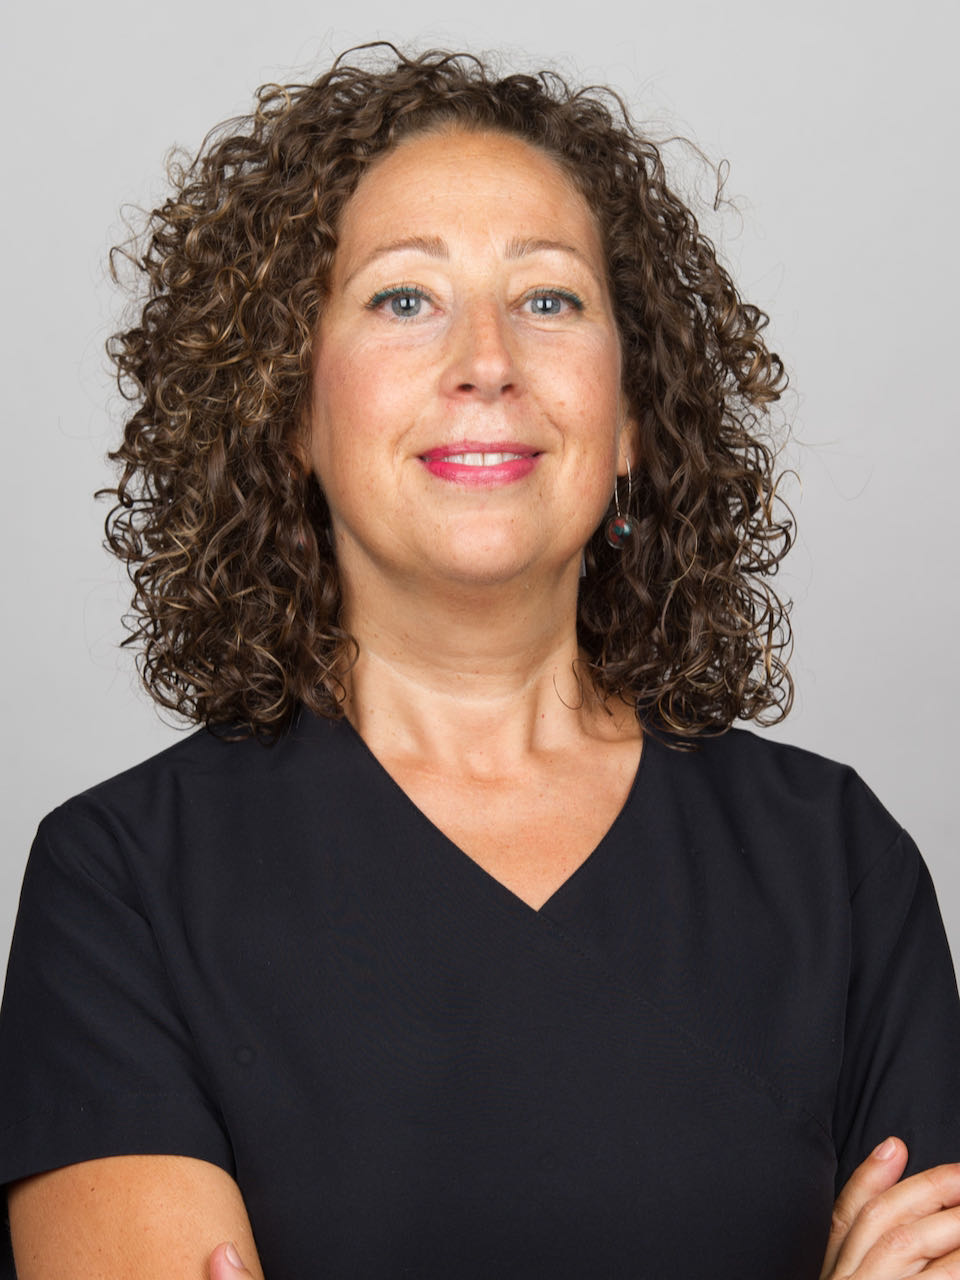 Sra. Montse Perez Lasierra